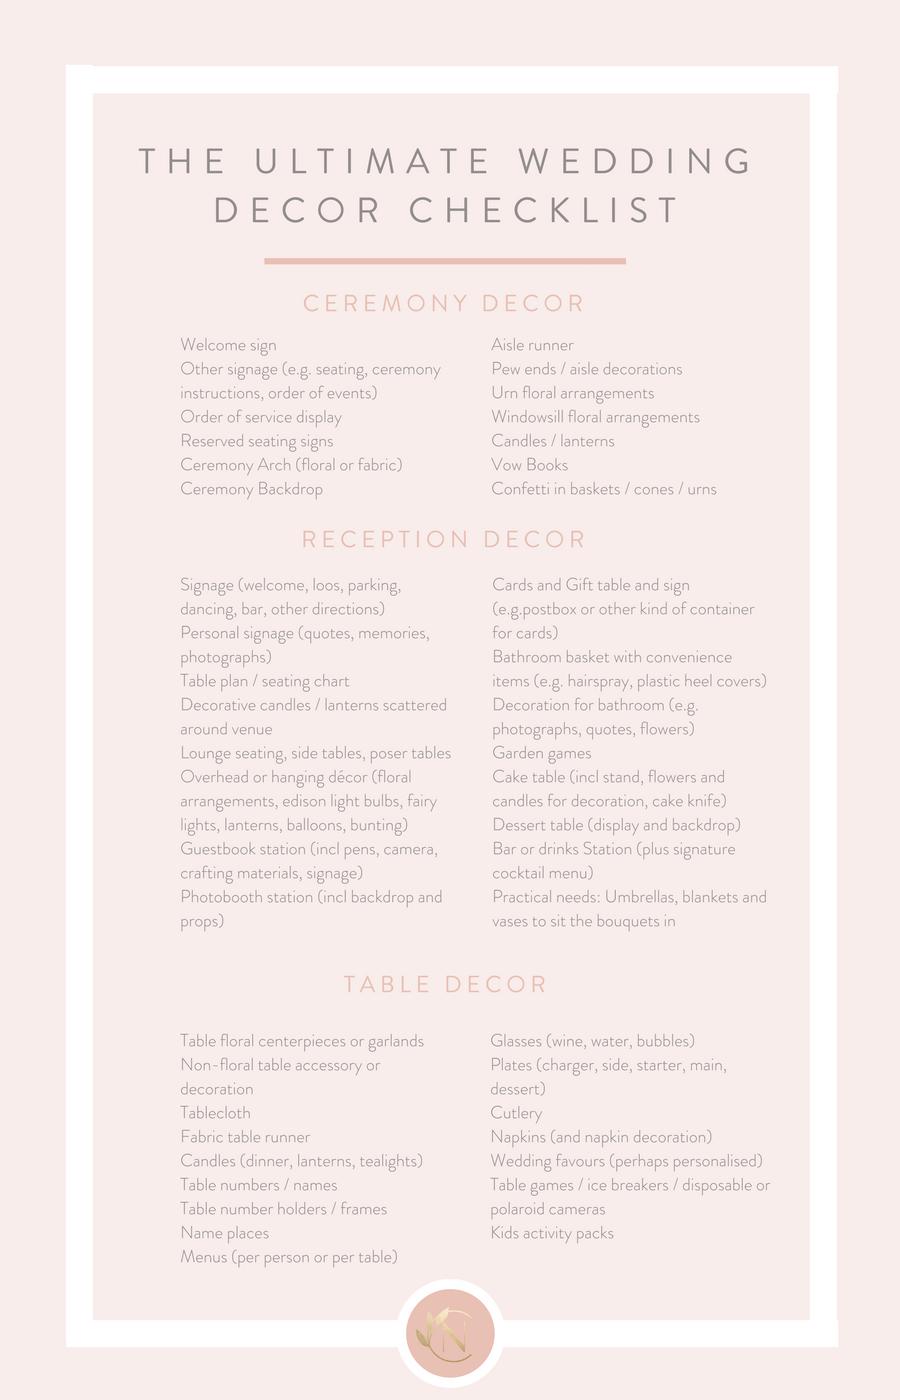 THE ULTIMATE WEDDING DECOR CHECKLIST